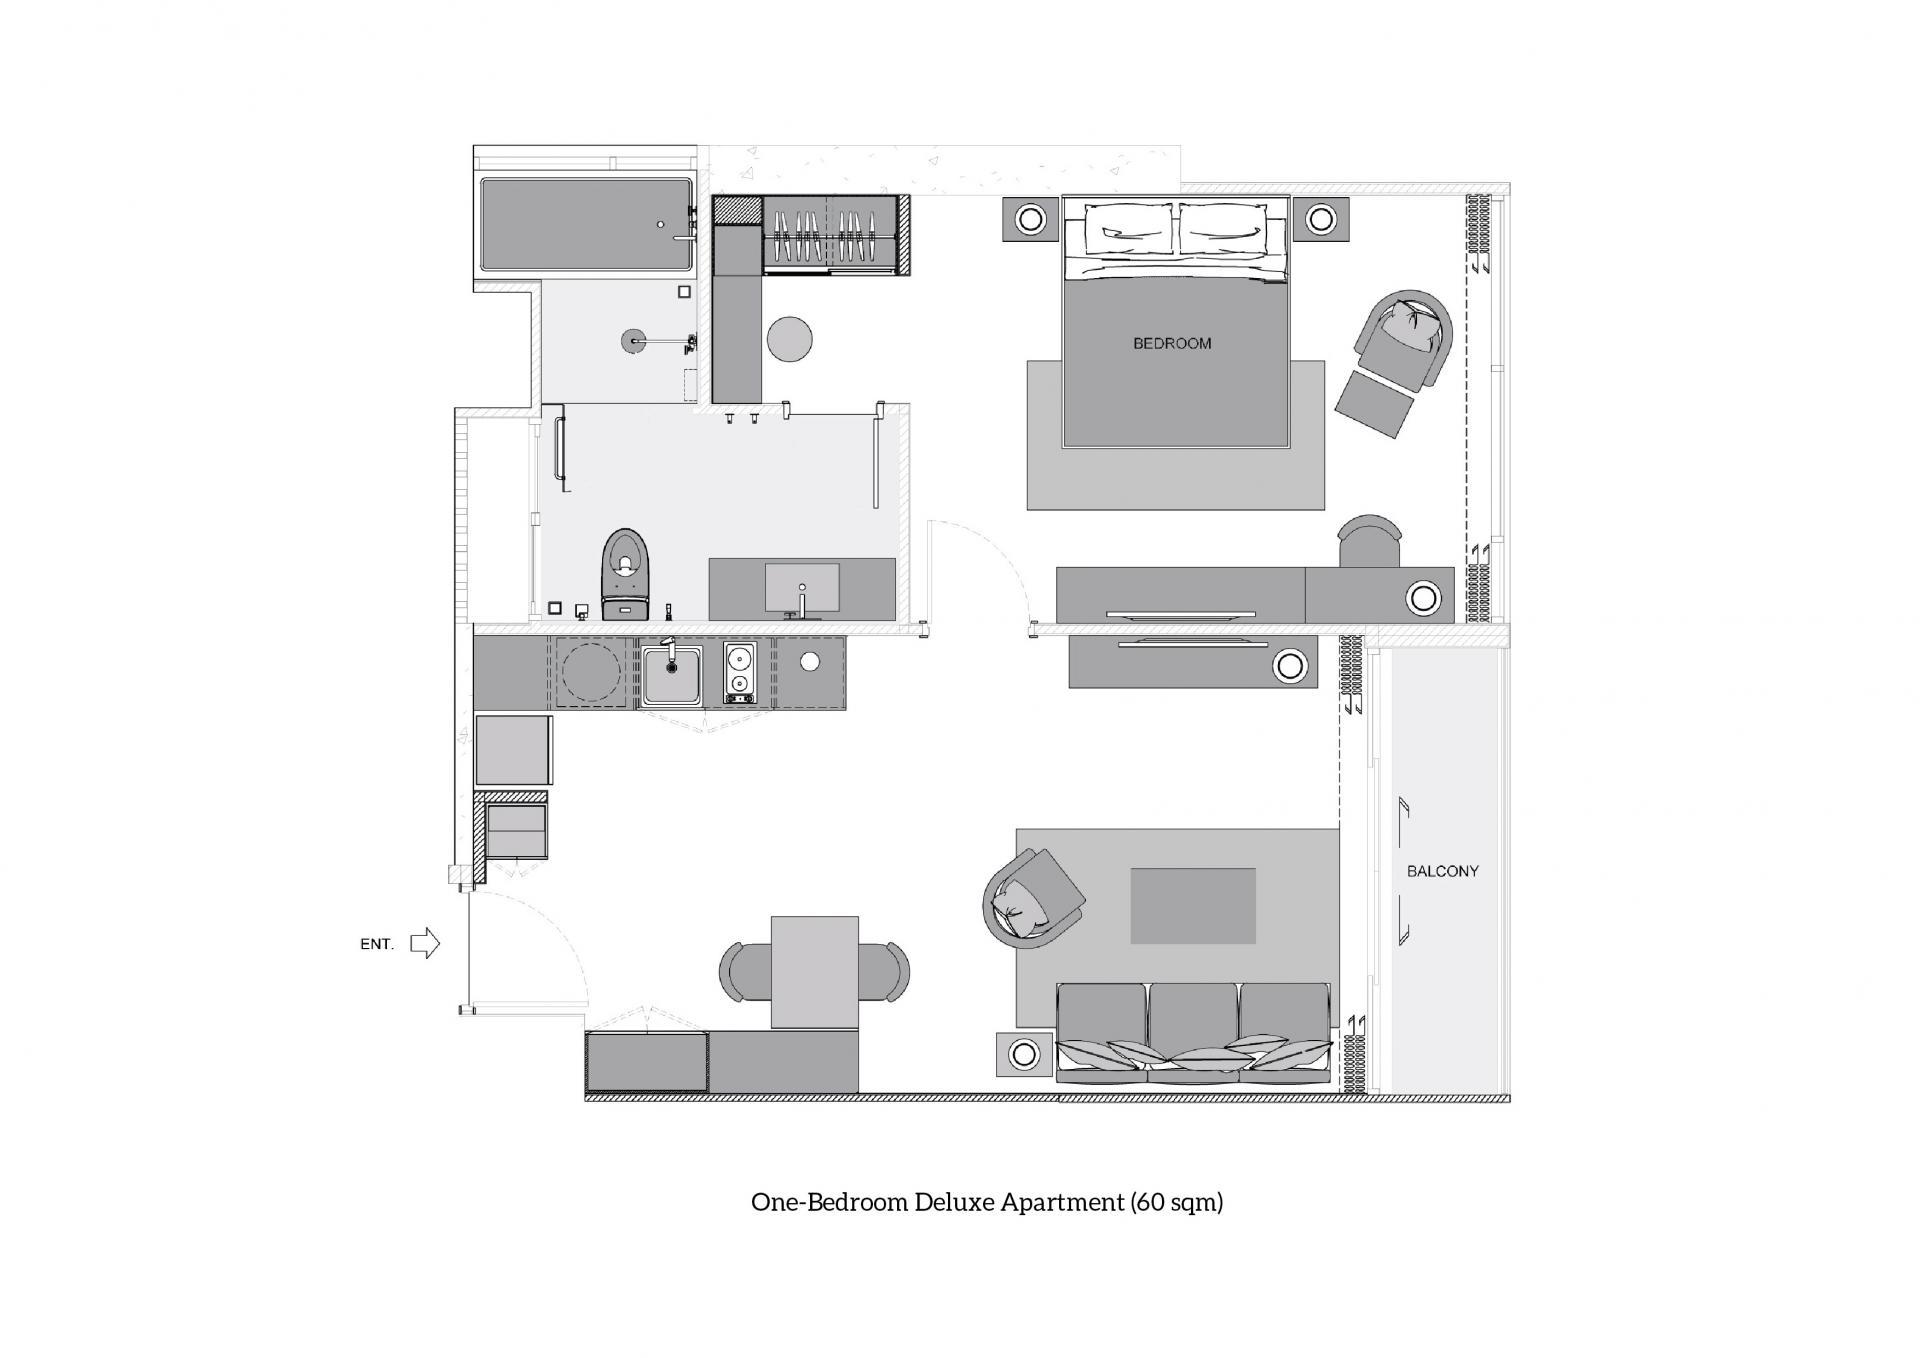 One-Bedroom Deluxe at Oakwood Suites Bangkok, Khlong Tan, Bangkok